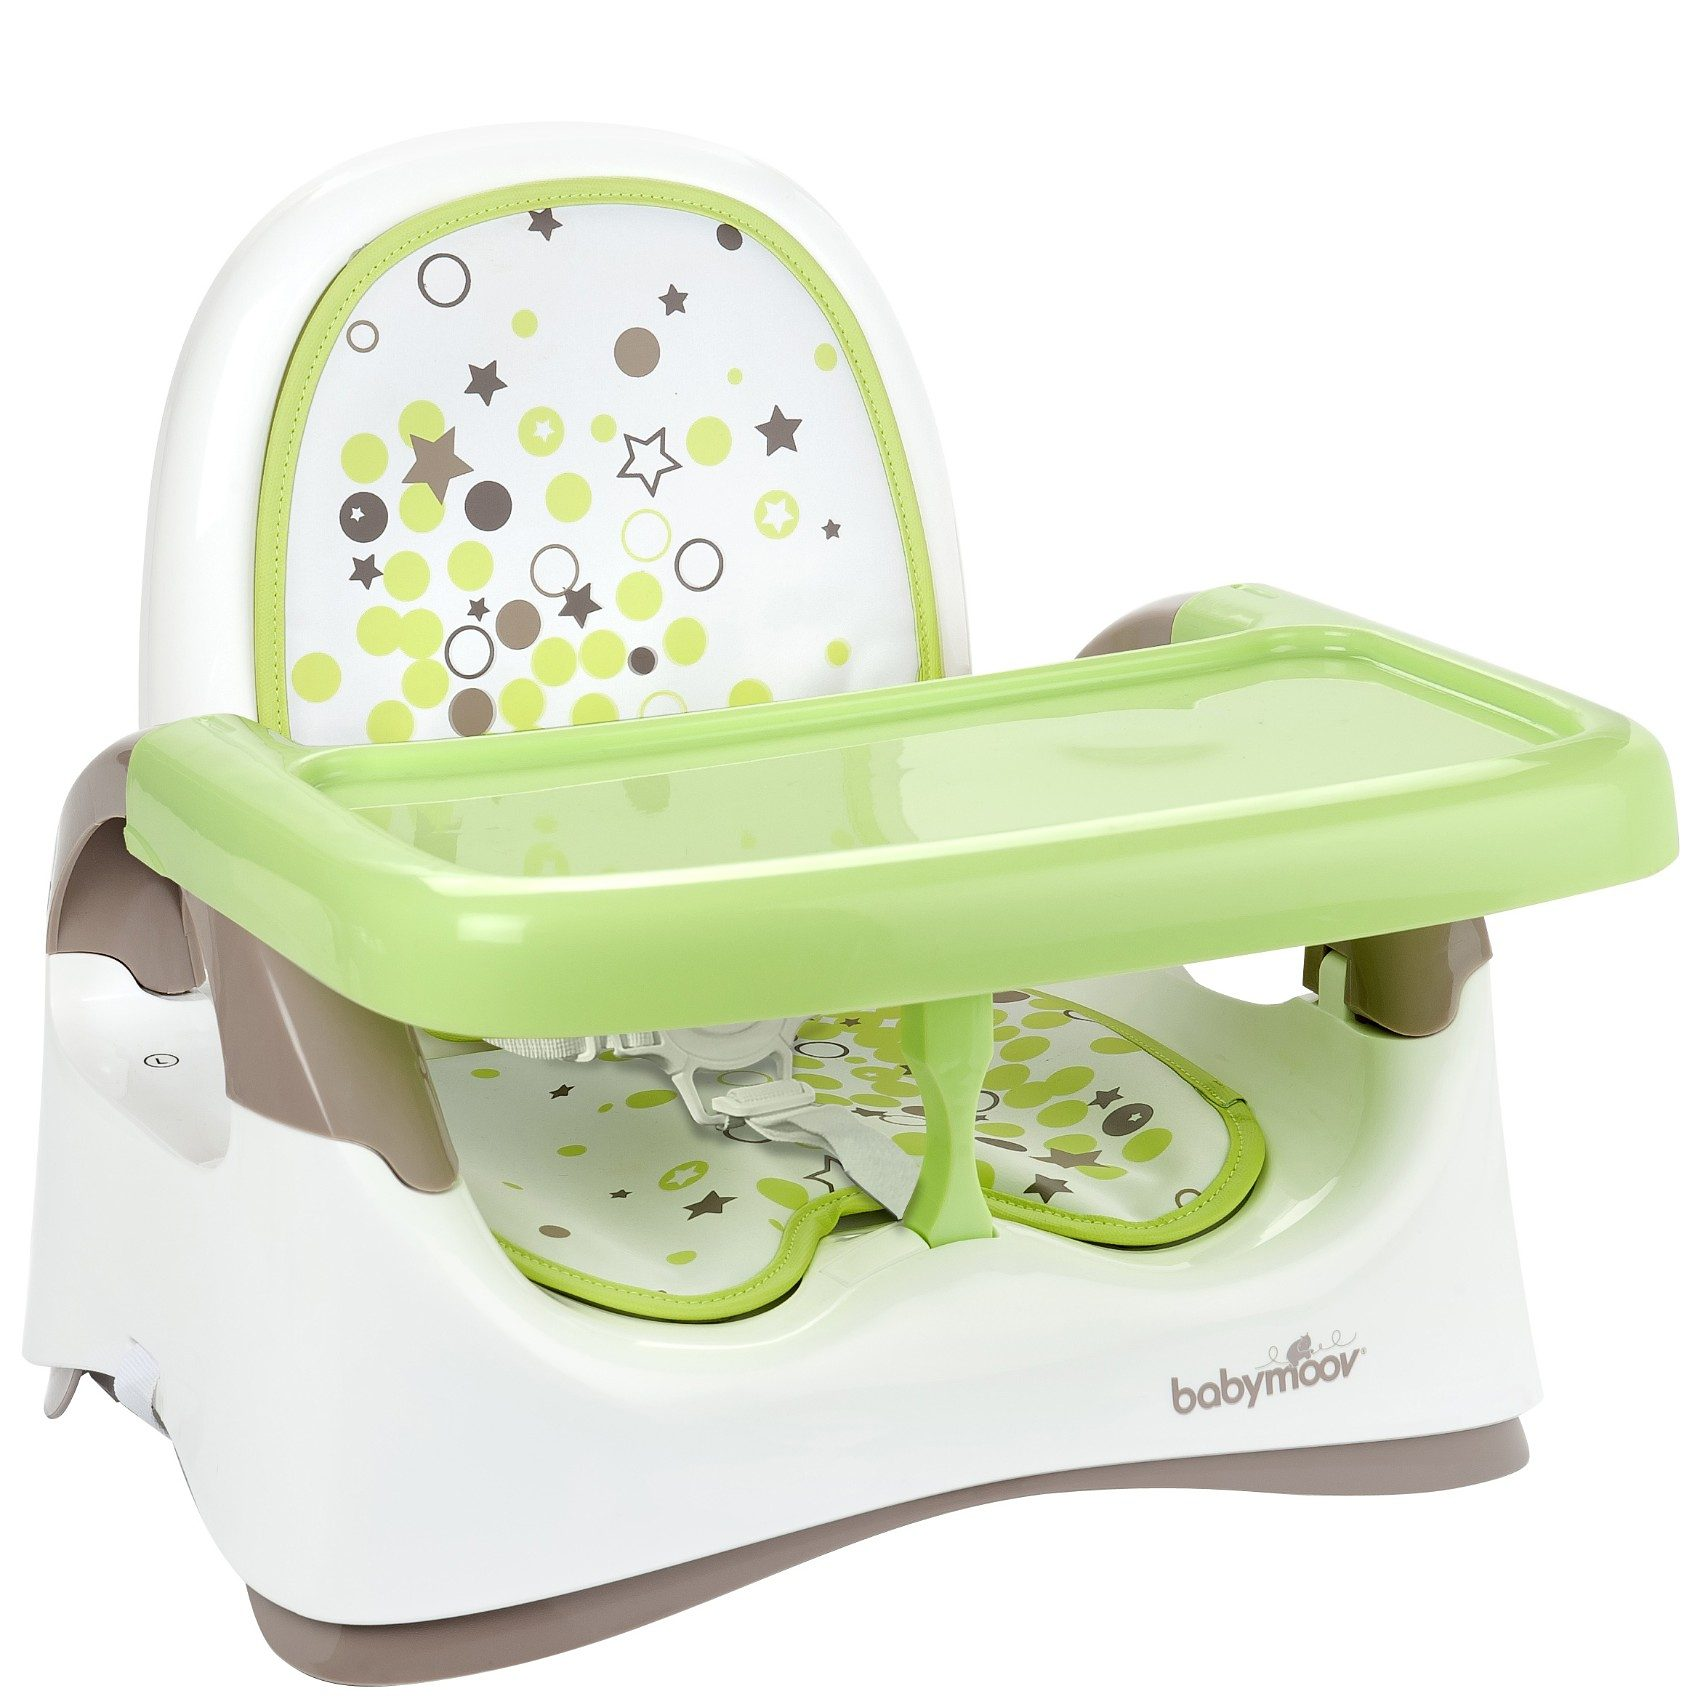 Babymoov Babystuhlsitz, braun/mandelgrün